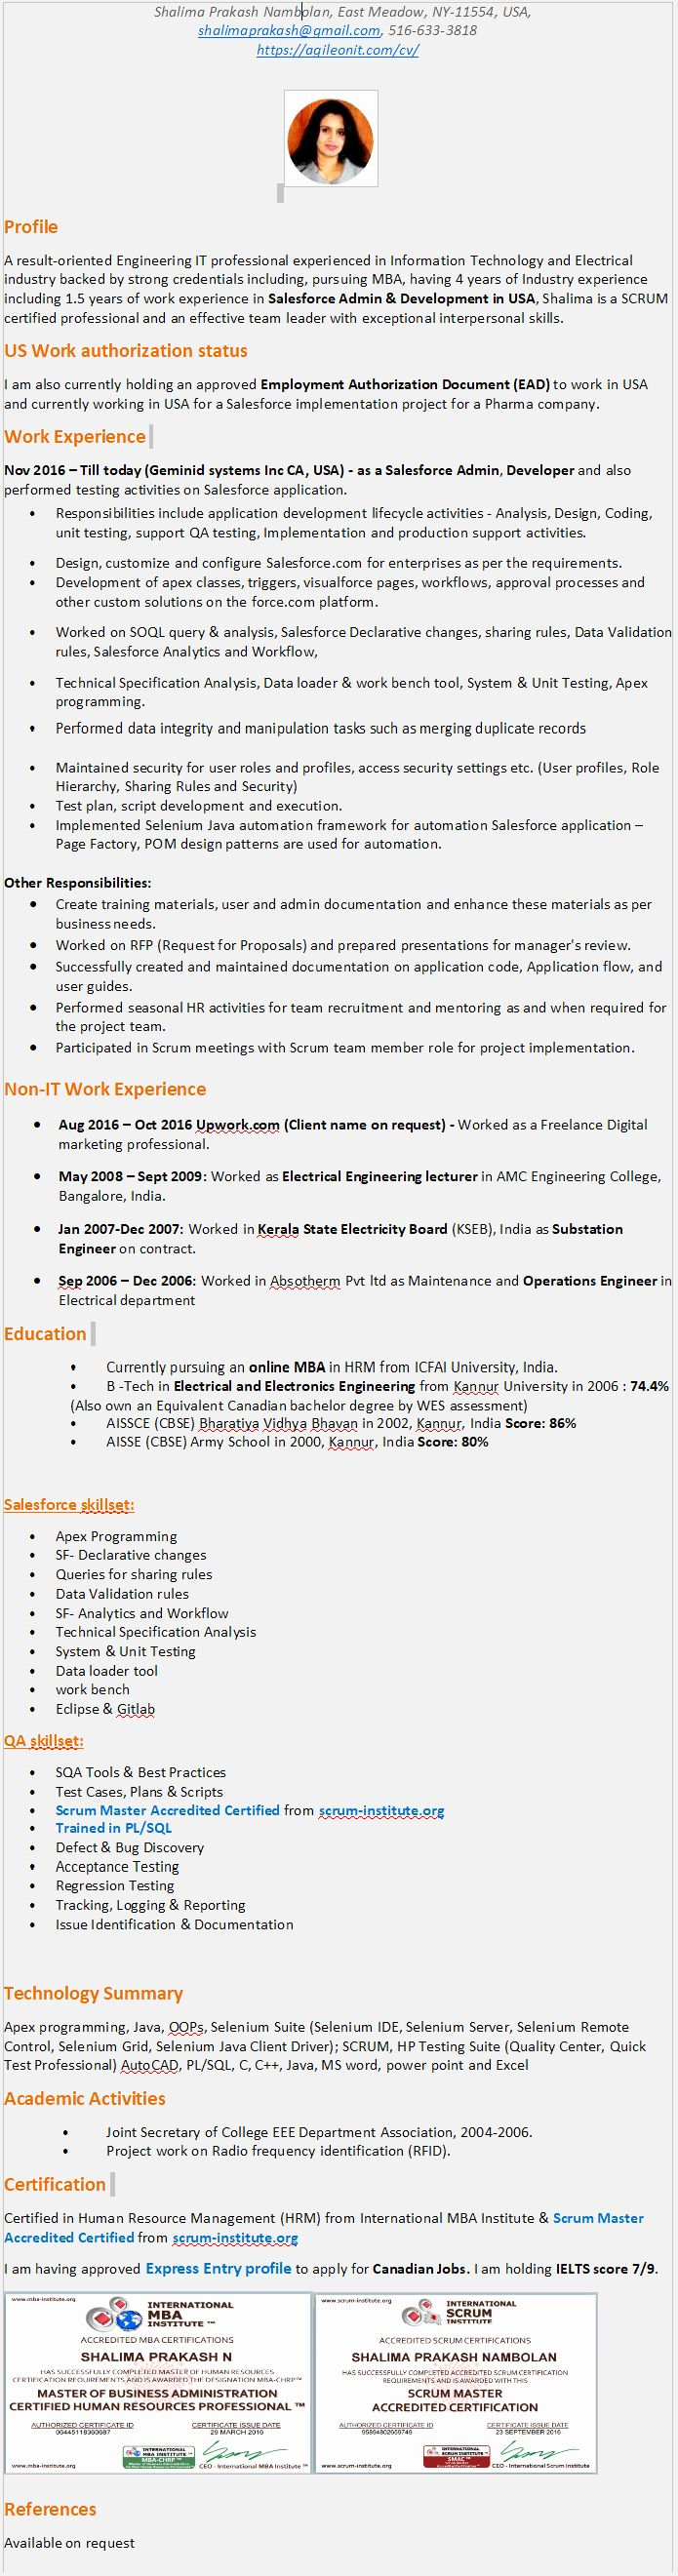 Java With Aws Resume Luxury Cv Blog Automation Testing Framework Selenium Java Python Robotics In 2020 Job Resume Samples Medical Assistant Resume Resume